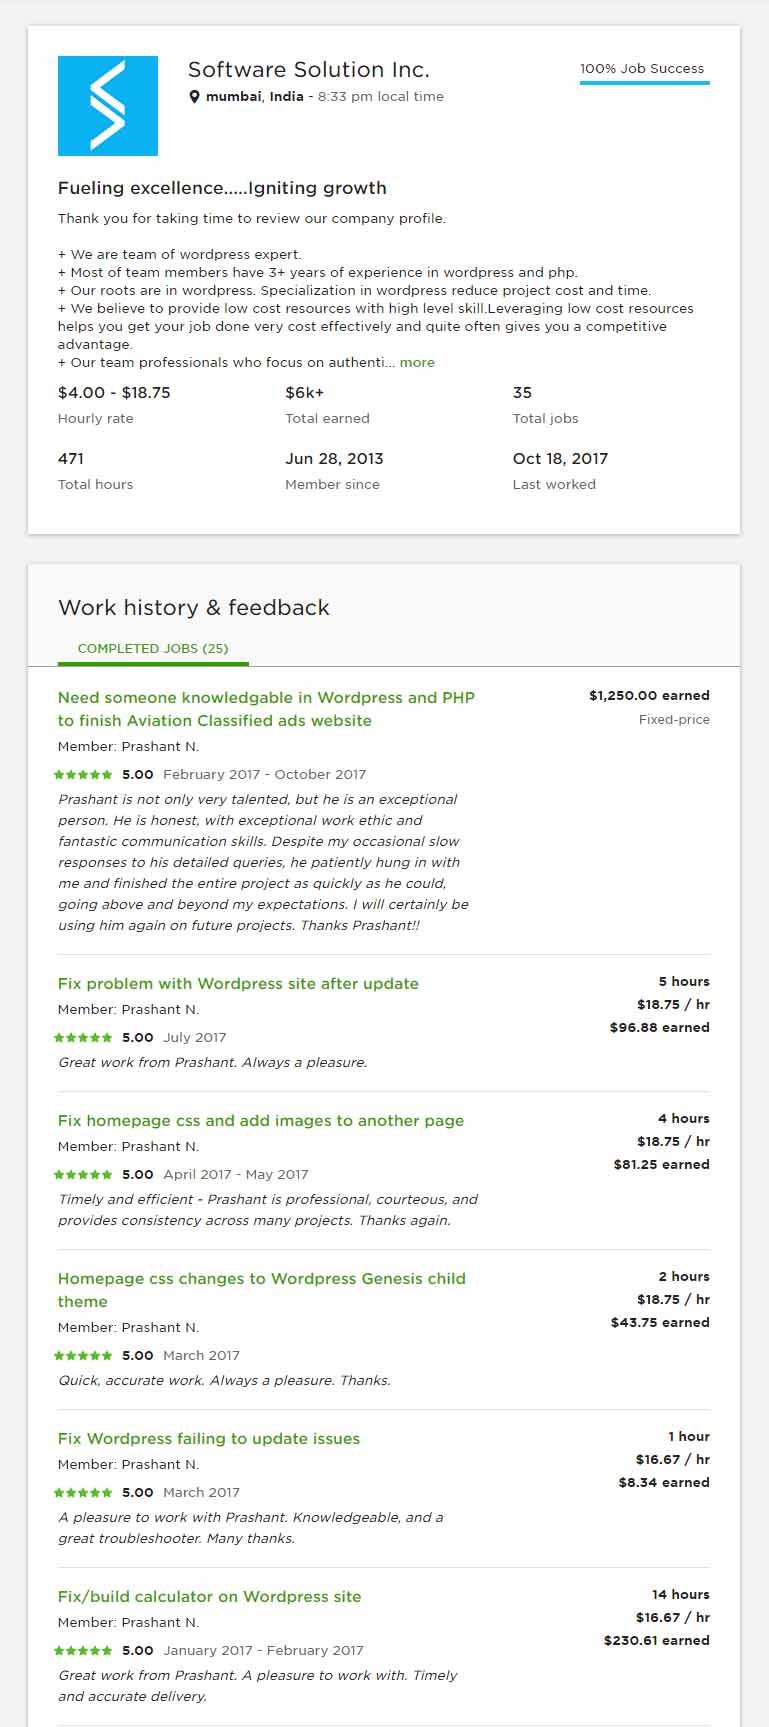 Software-Solution-Inc-mumbai-India-Upwork